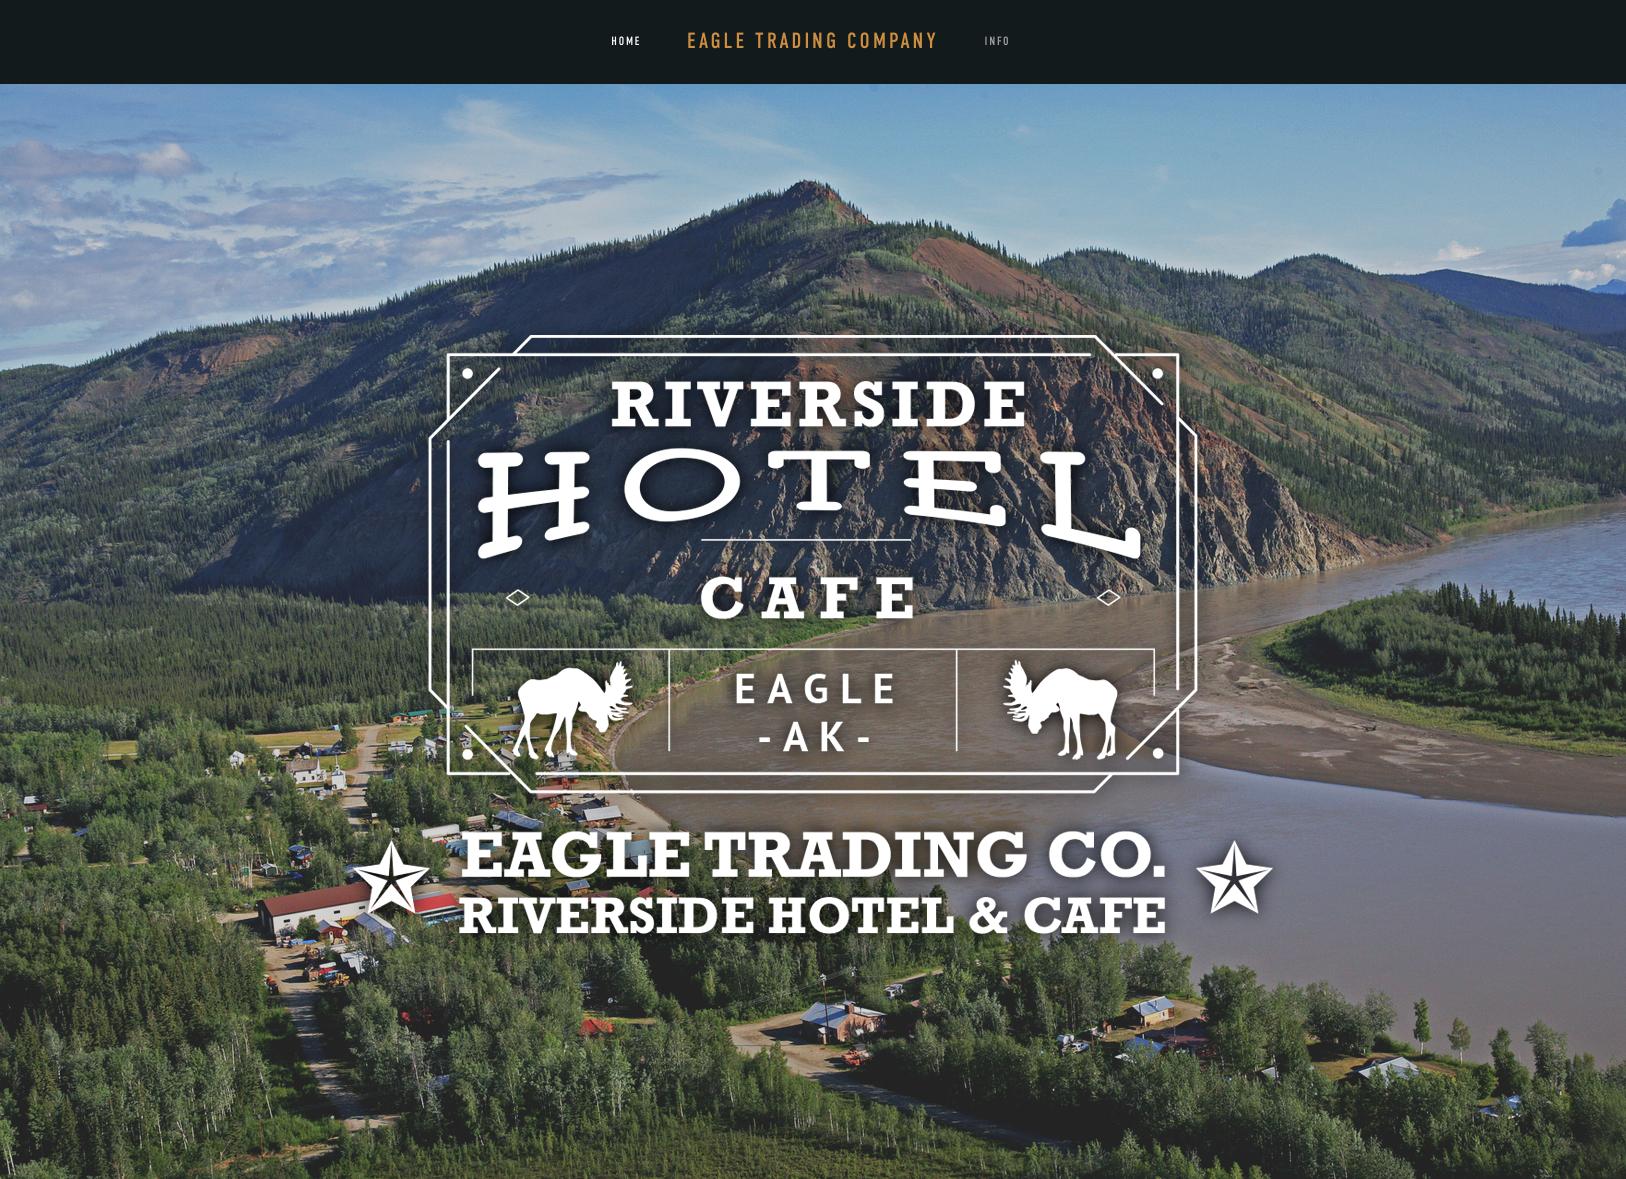 Eagle Trading Co. - Riverside Hotel & Cafe